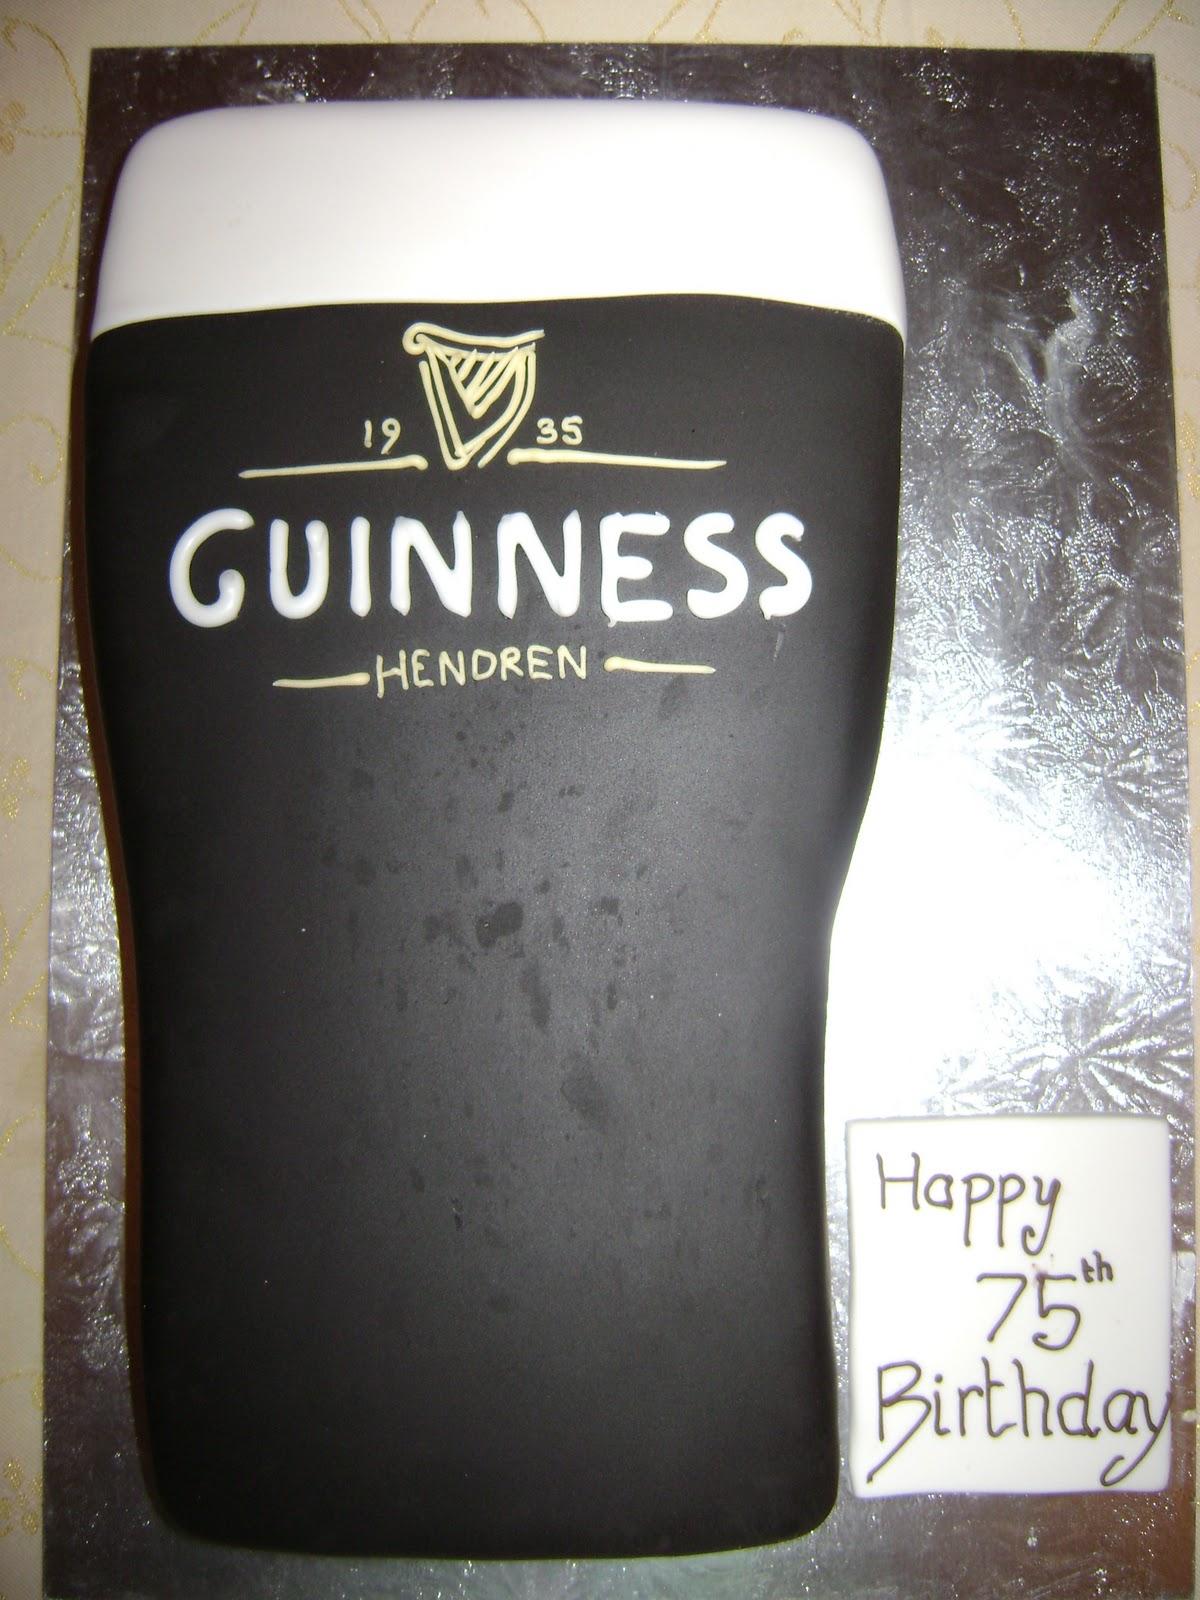 Pleasant Caroline Jane Cakes Pint Of Guinness Birthday Cake Birthday Cards Printable Benkemecafe Filternl